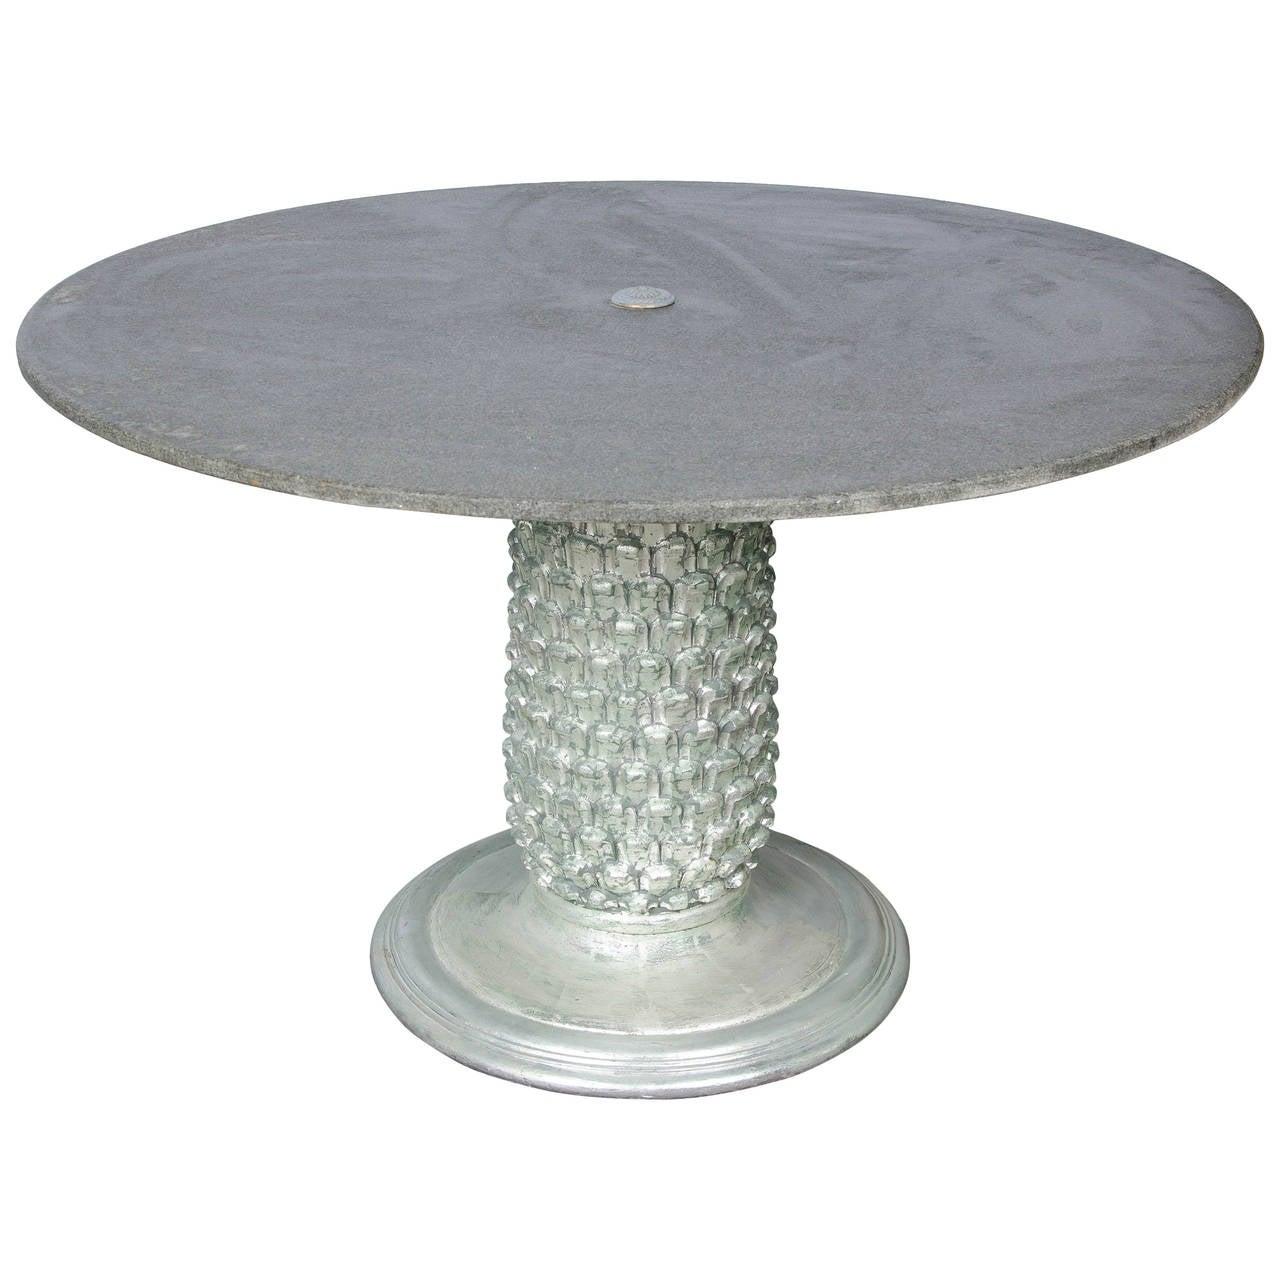 1950s Italian Pineapple Shape Dining Table At 1stdibs